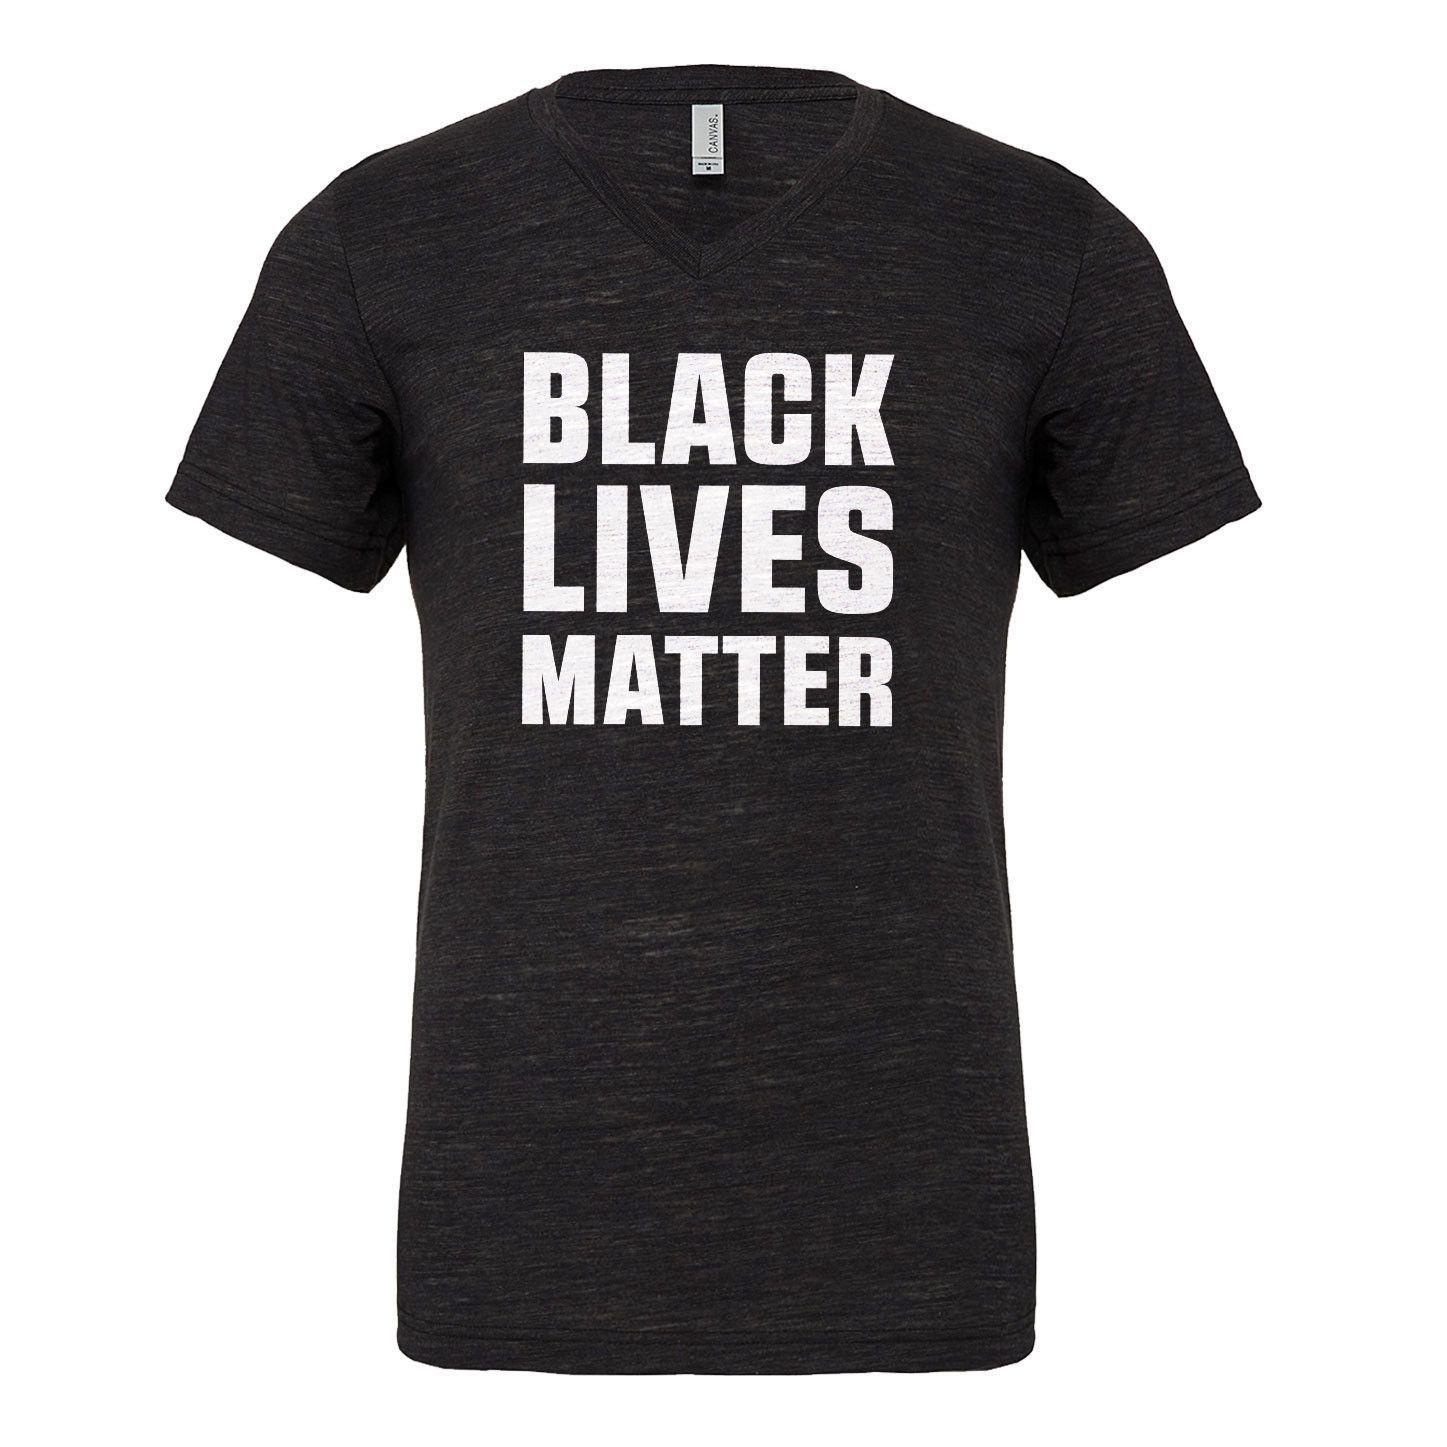 Black Lives Matter Mens Vneck Short Sleeve T-shirt